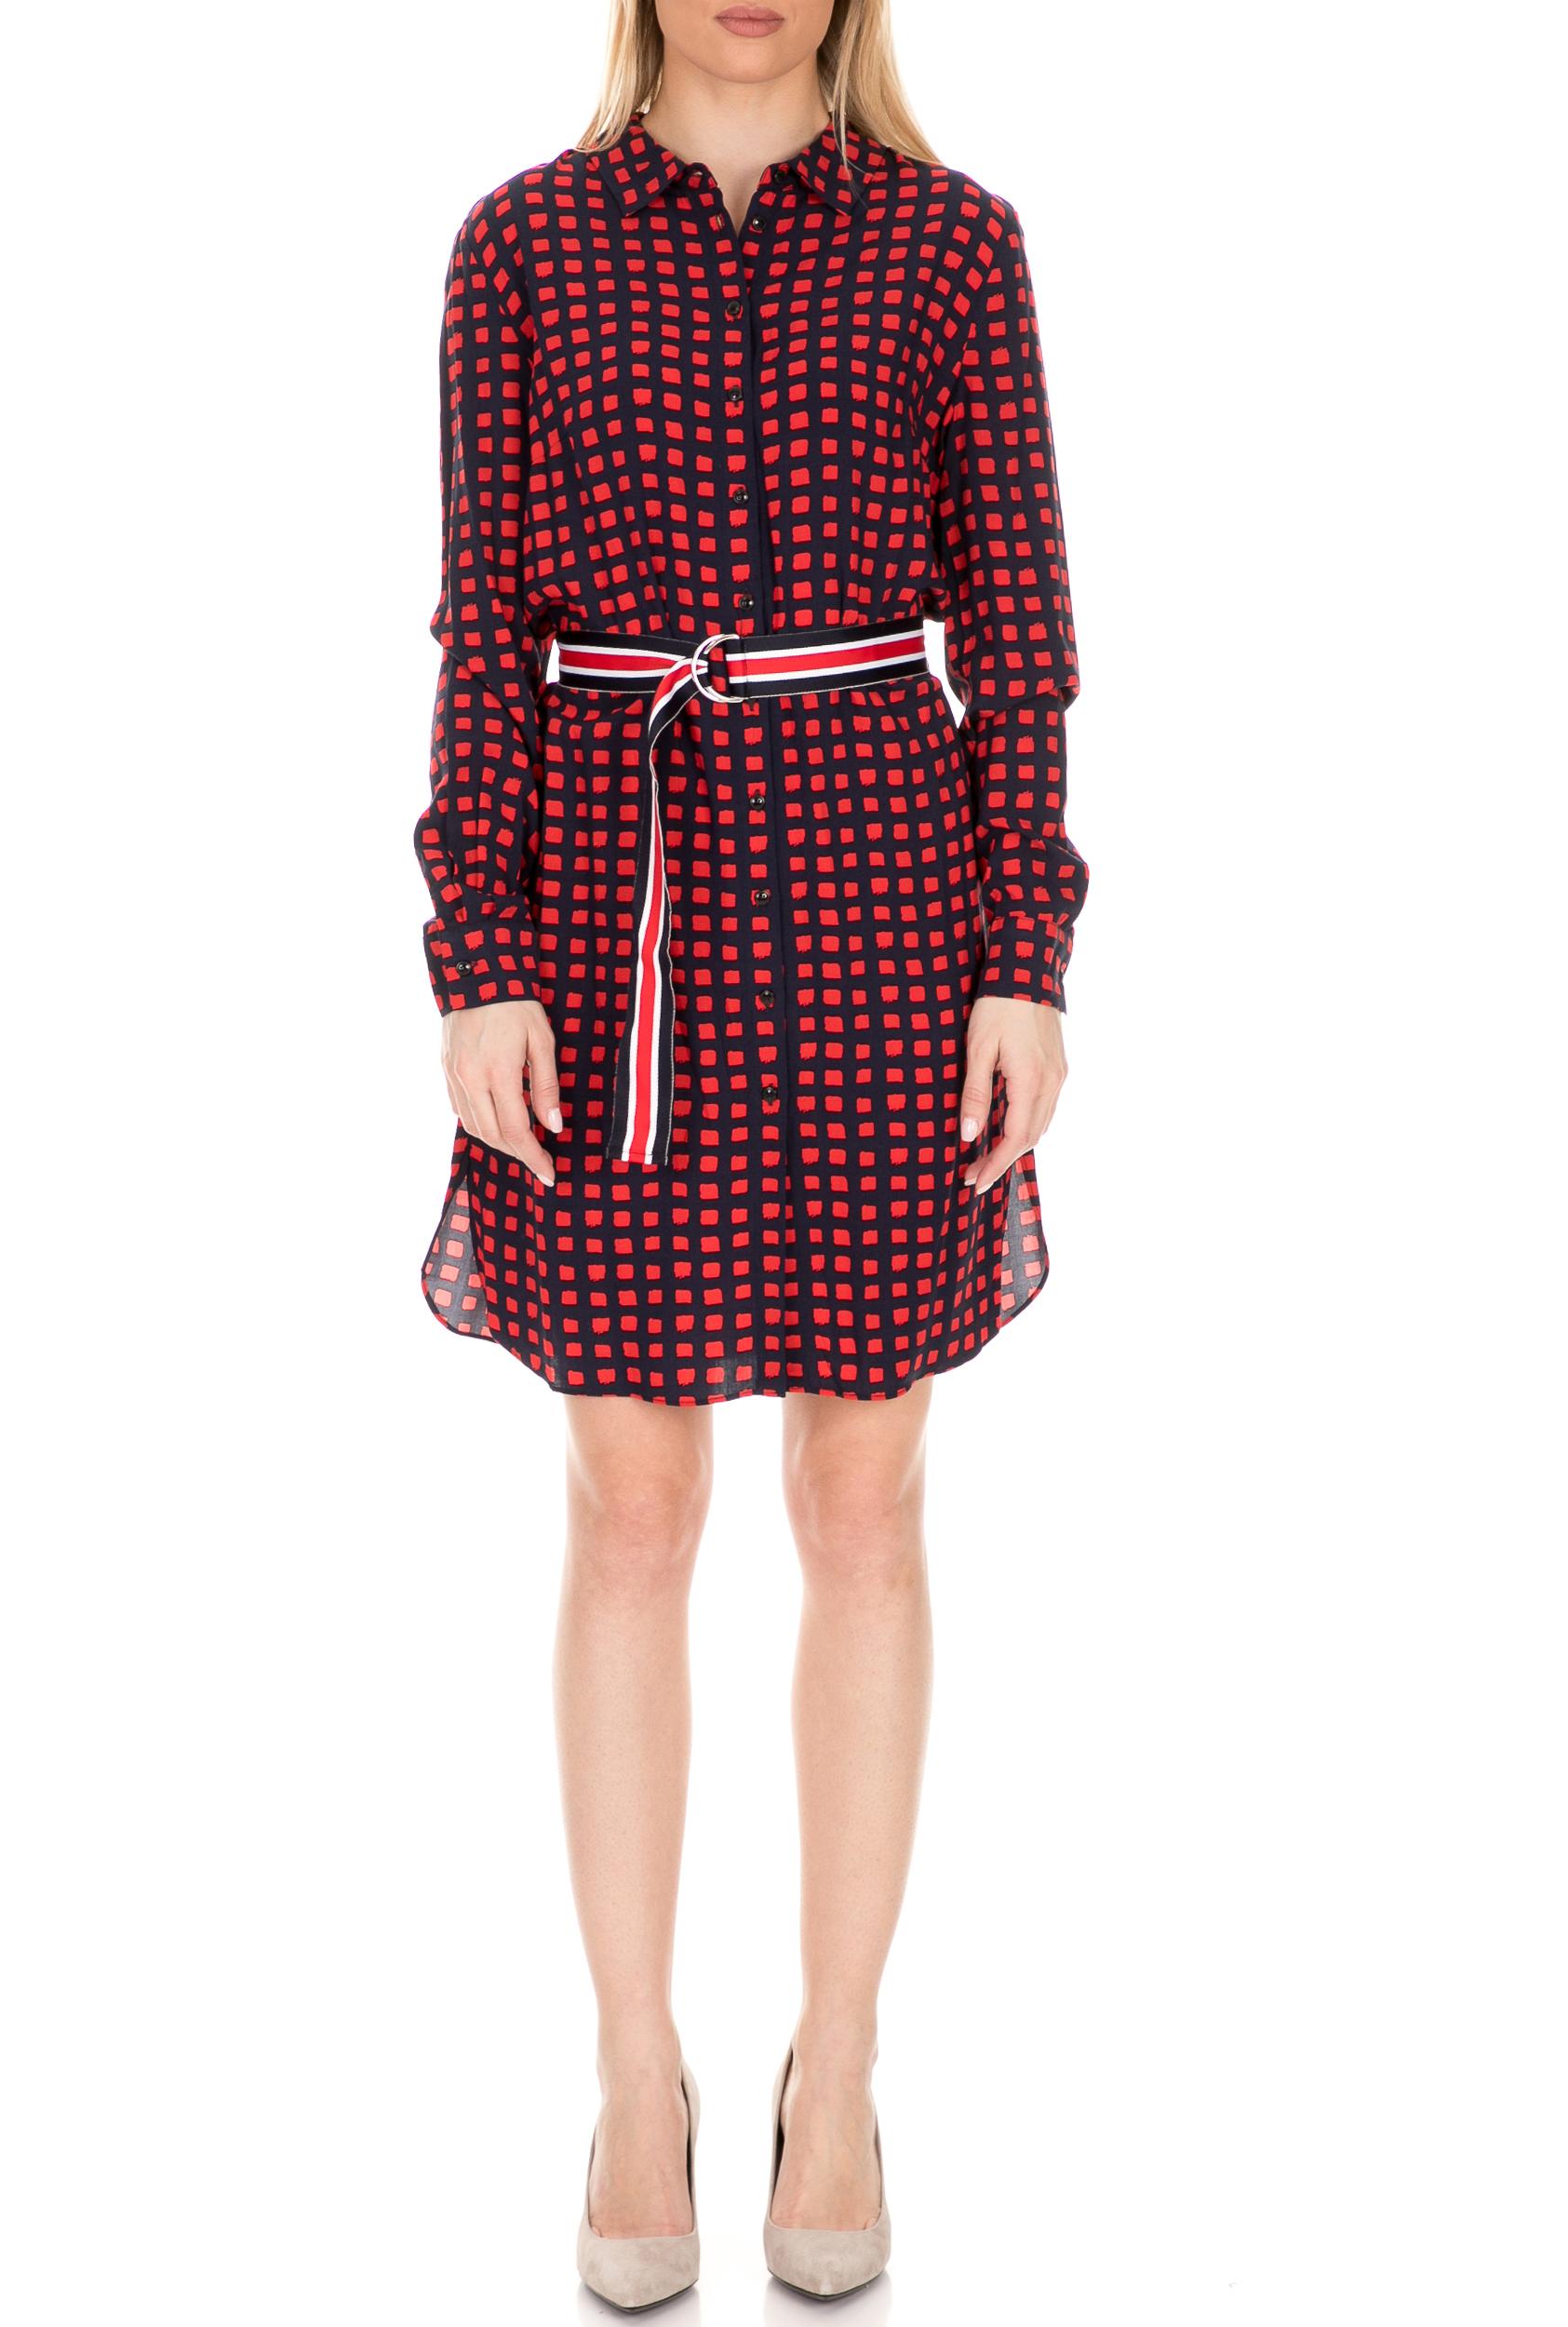 KOCCA - Γυναικείο φόρεμα KOCCA LIQUOR κόκκινο-μπλε γυναικεία ρούχα φόρεματα μίνι